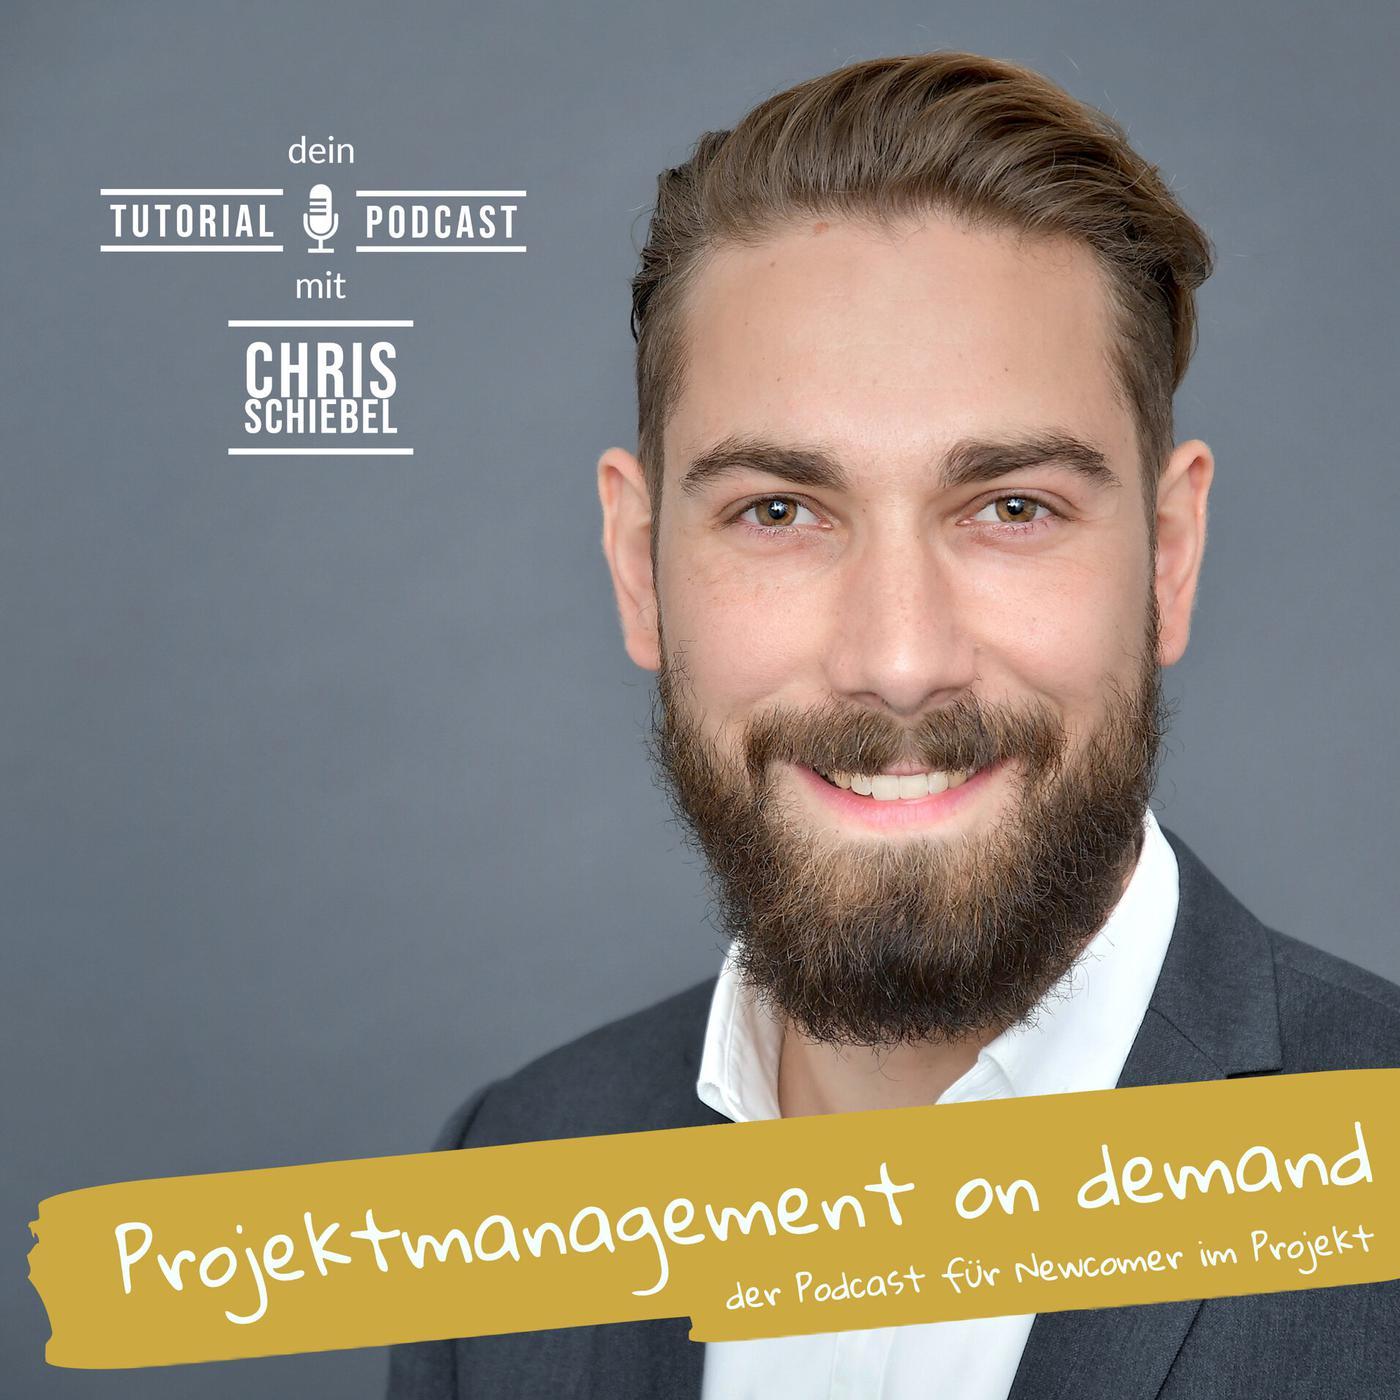 Projektmanagement on demand (podcast) - Chris Schiebel | Listen Notes